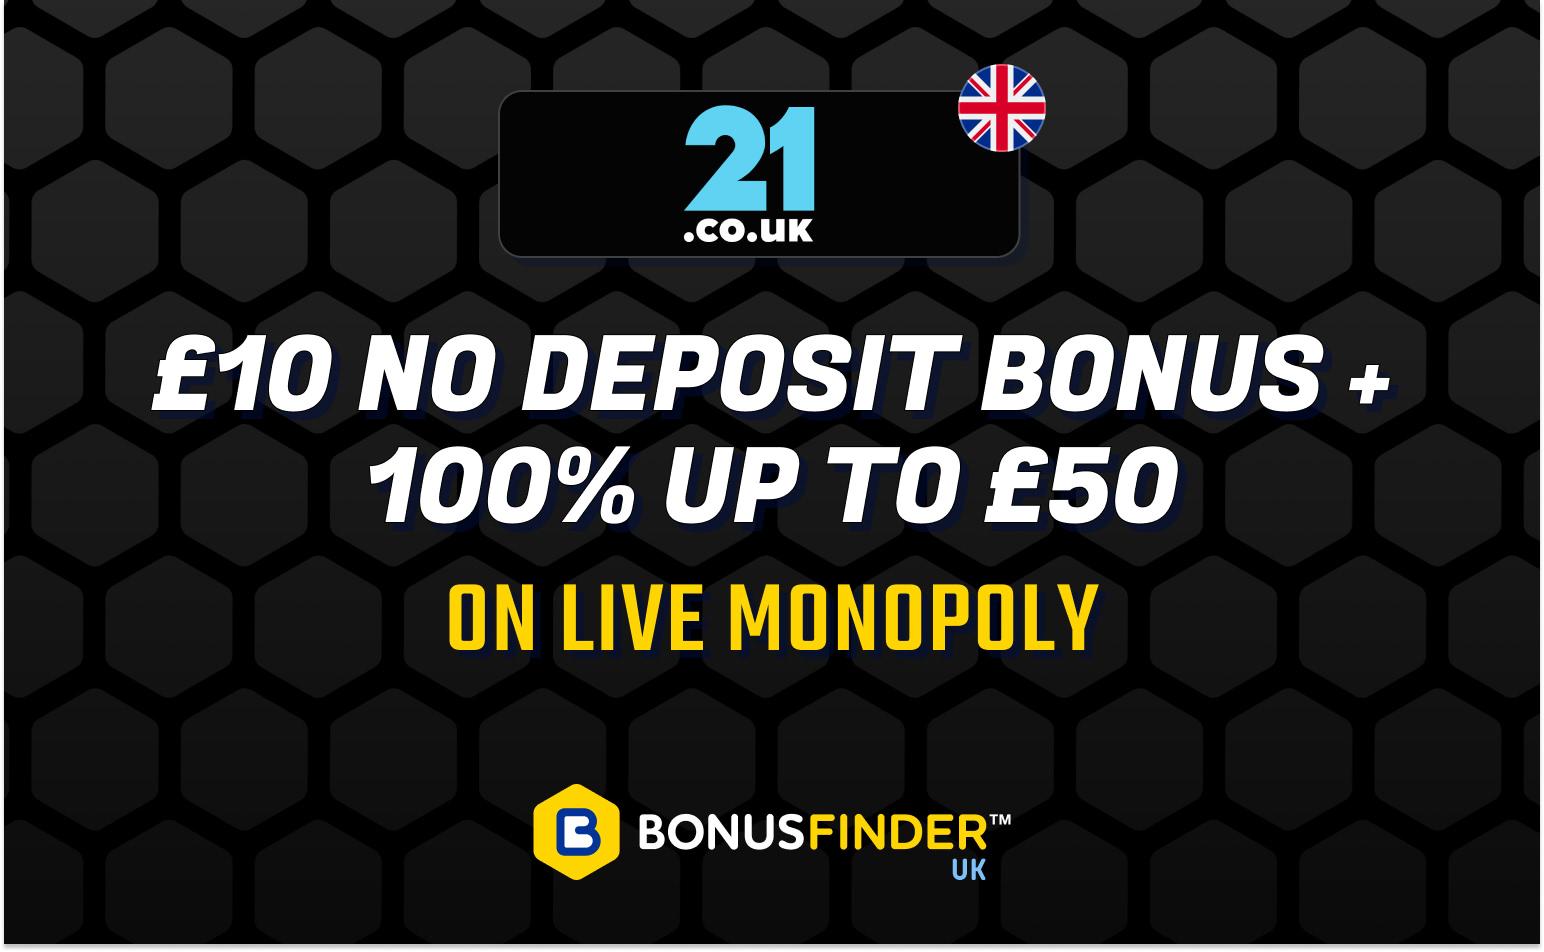 live monopoly casino no deposit bonus